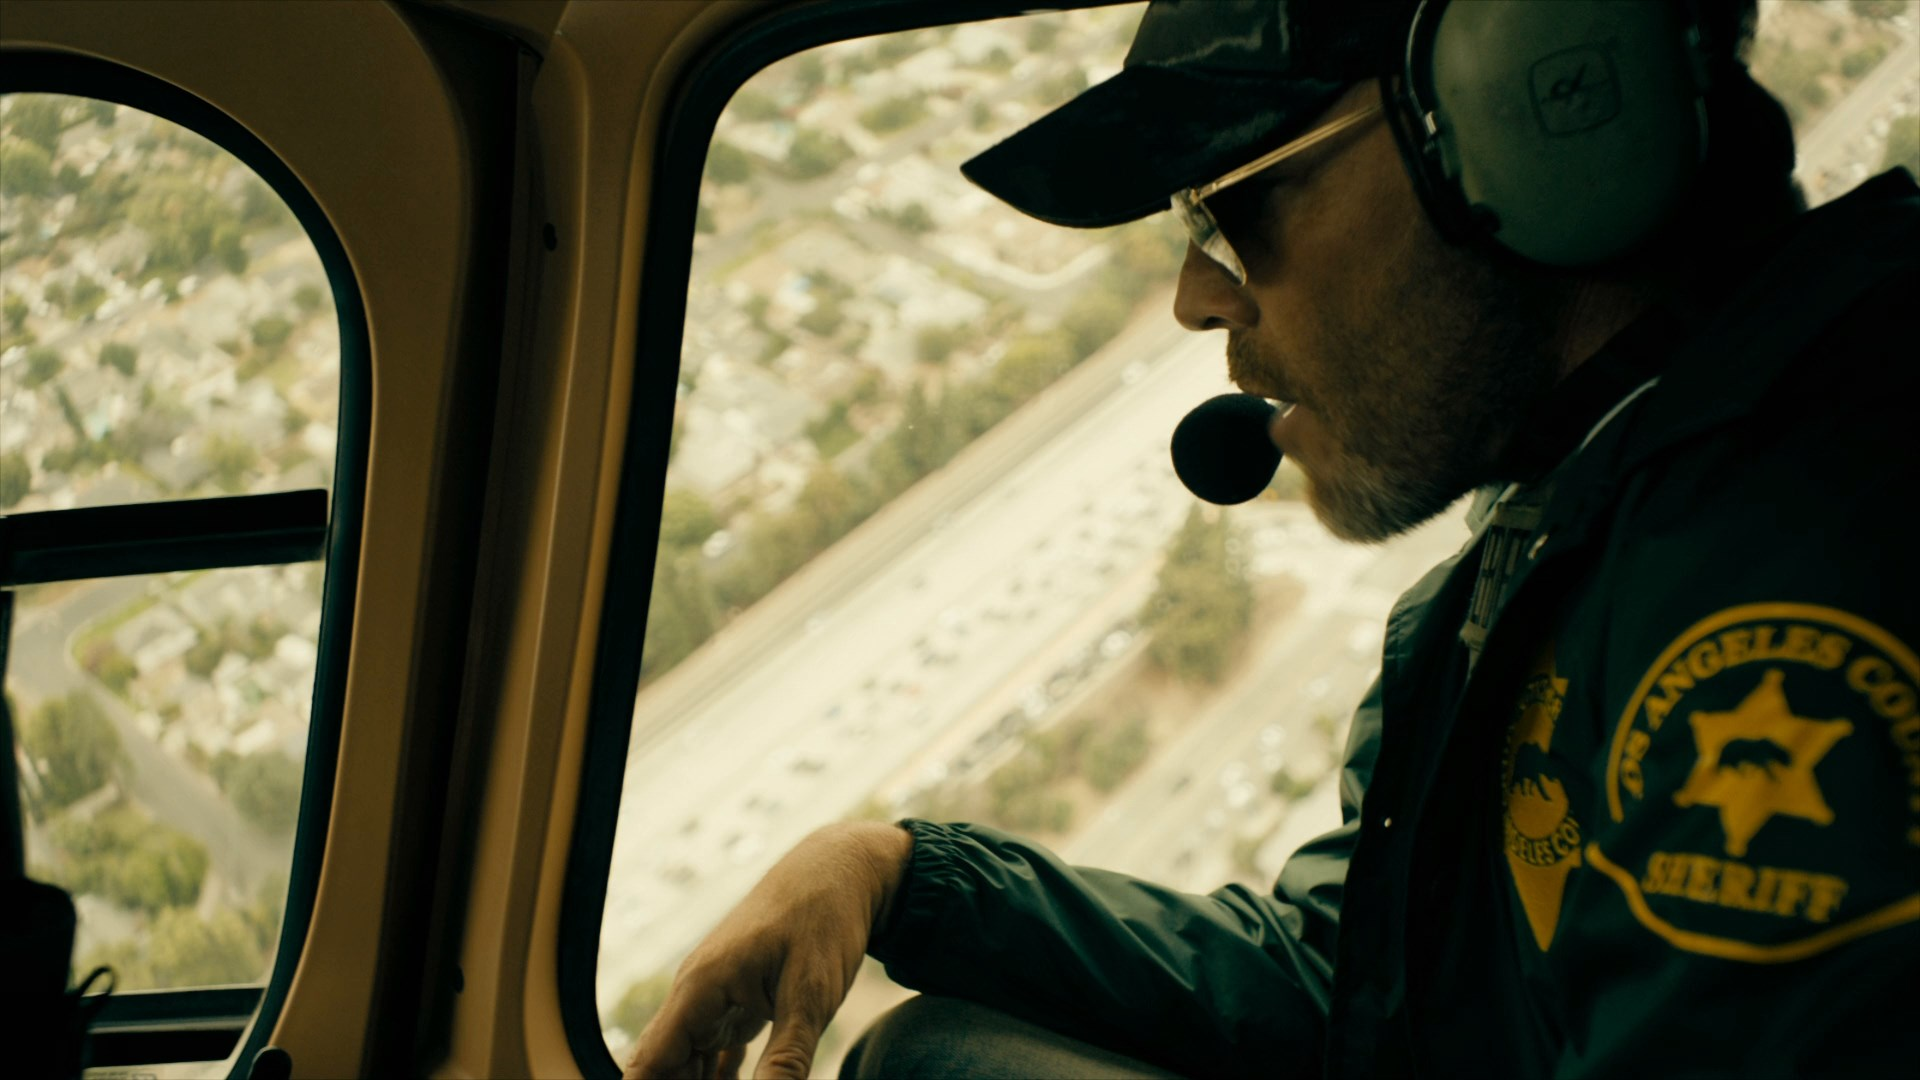 Deputy Temporada 1 (2020) 1080p WEB-DL Latino